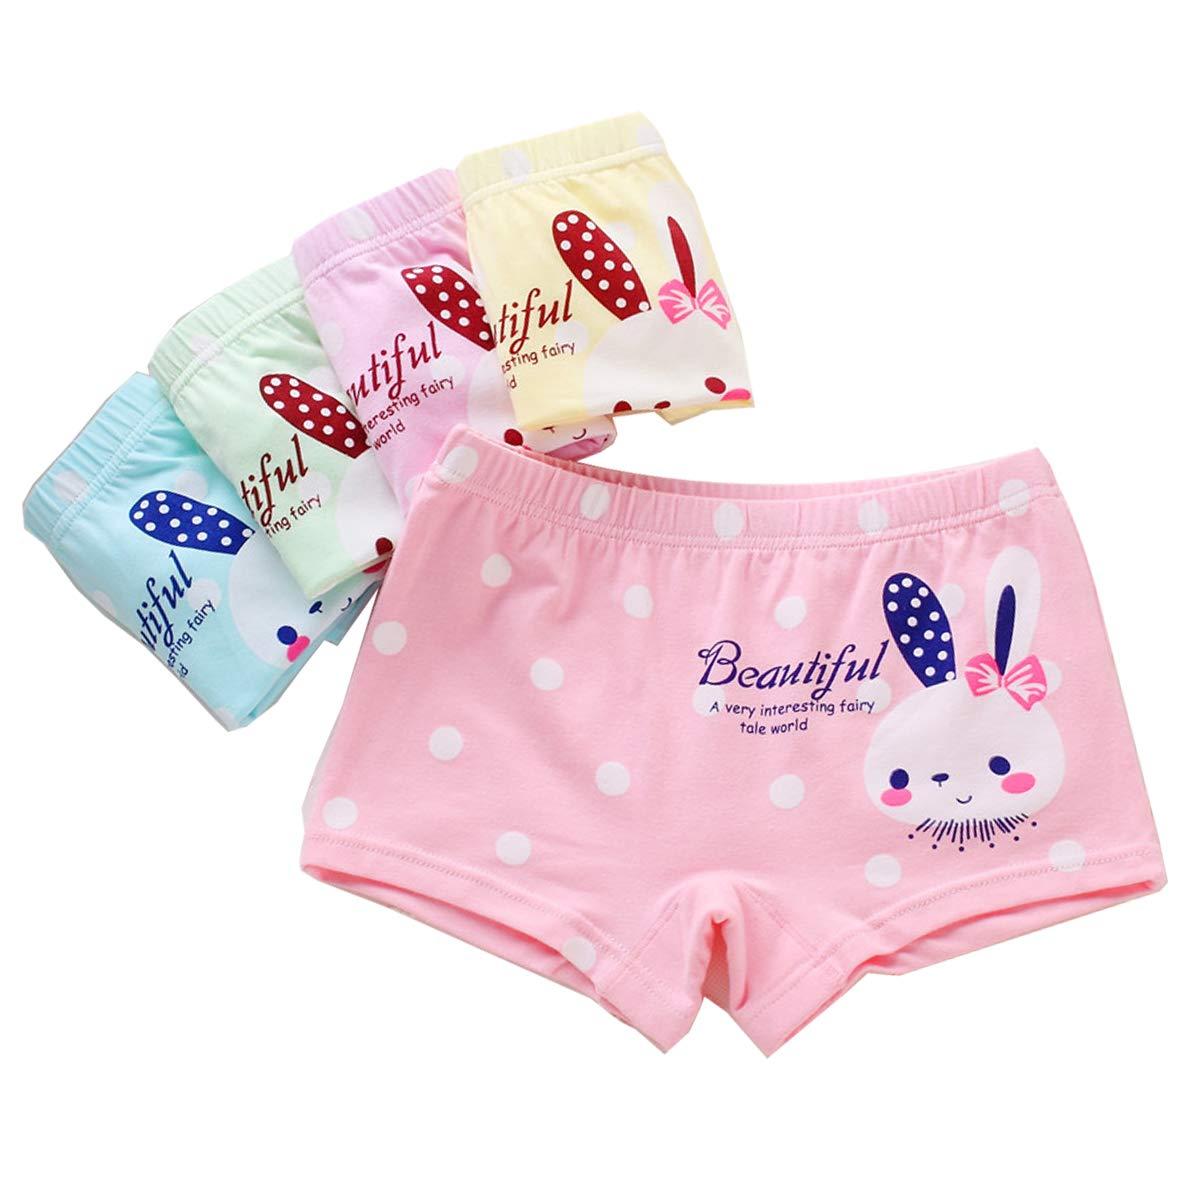 SYROSA Girl's Knickers Cotton Cute Rabbit 5 Pack Boyshort Polka Dot Underwear Size 1-9 Years